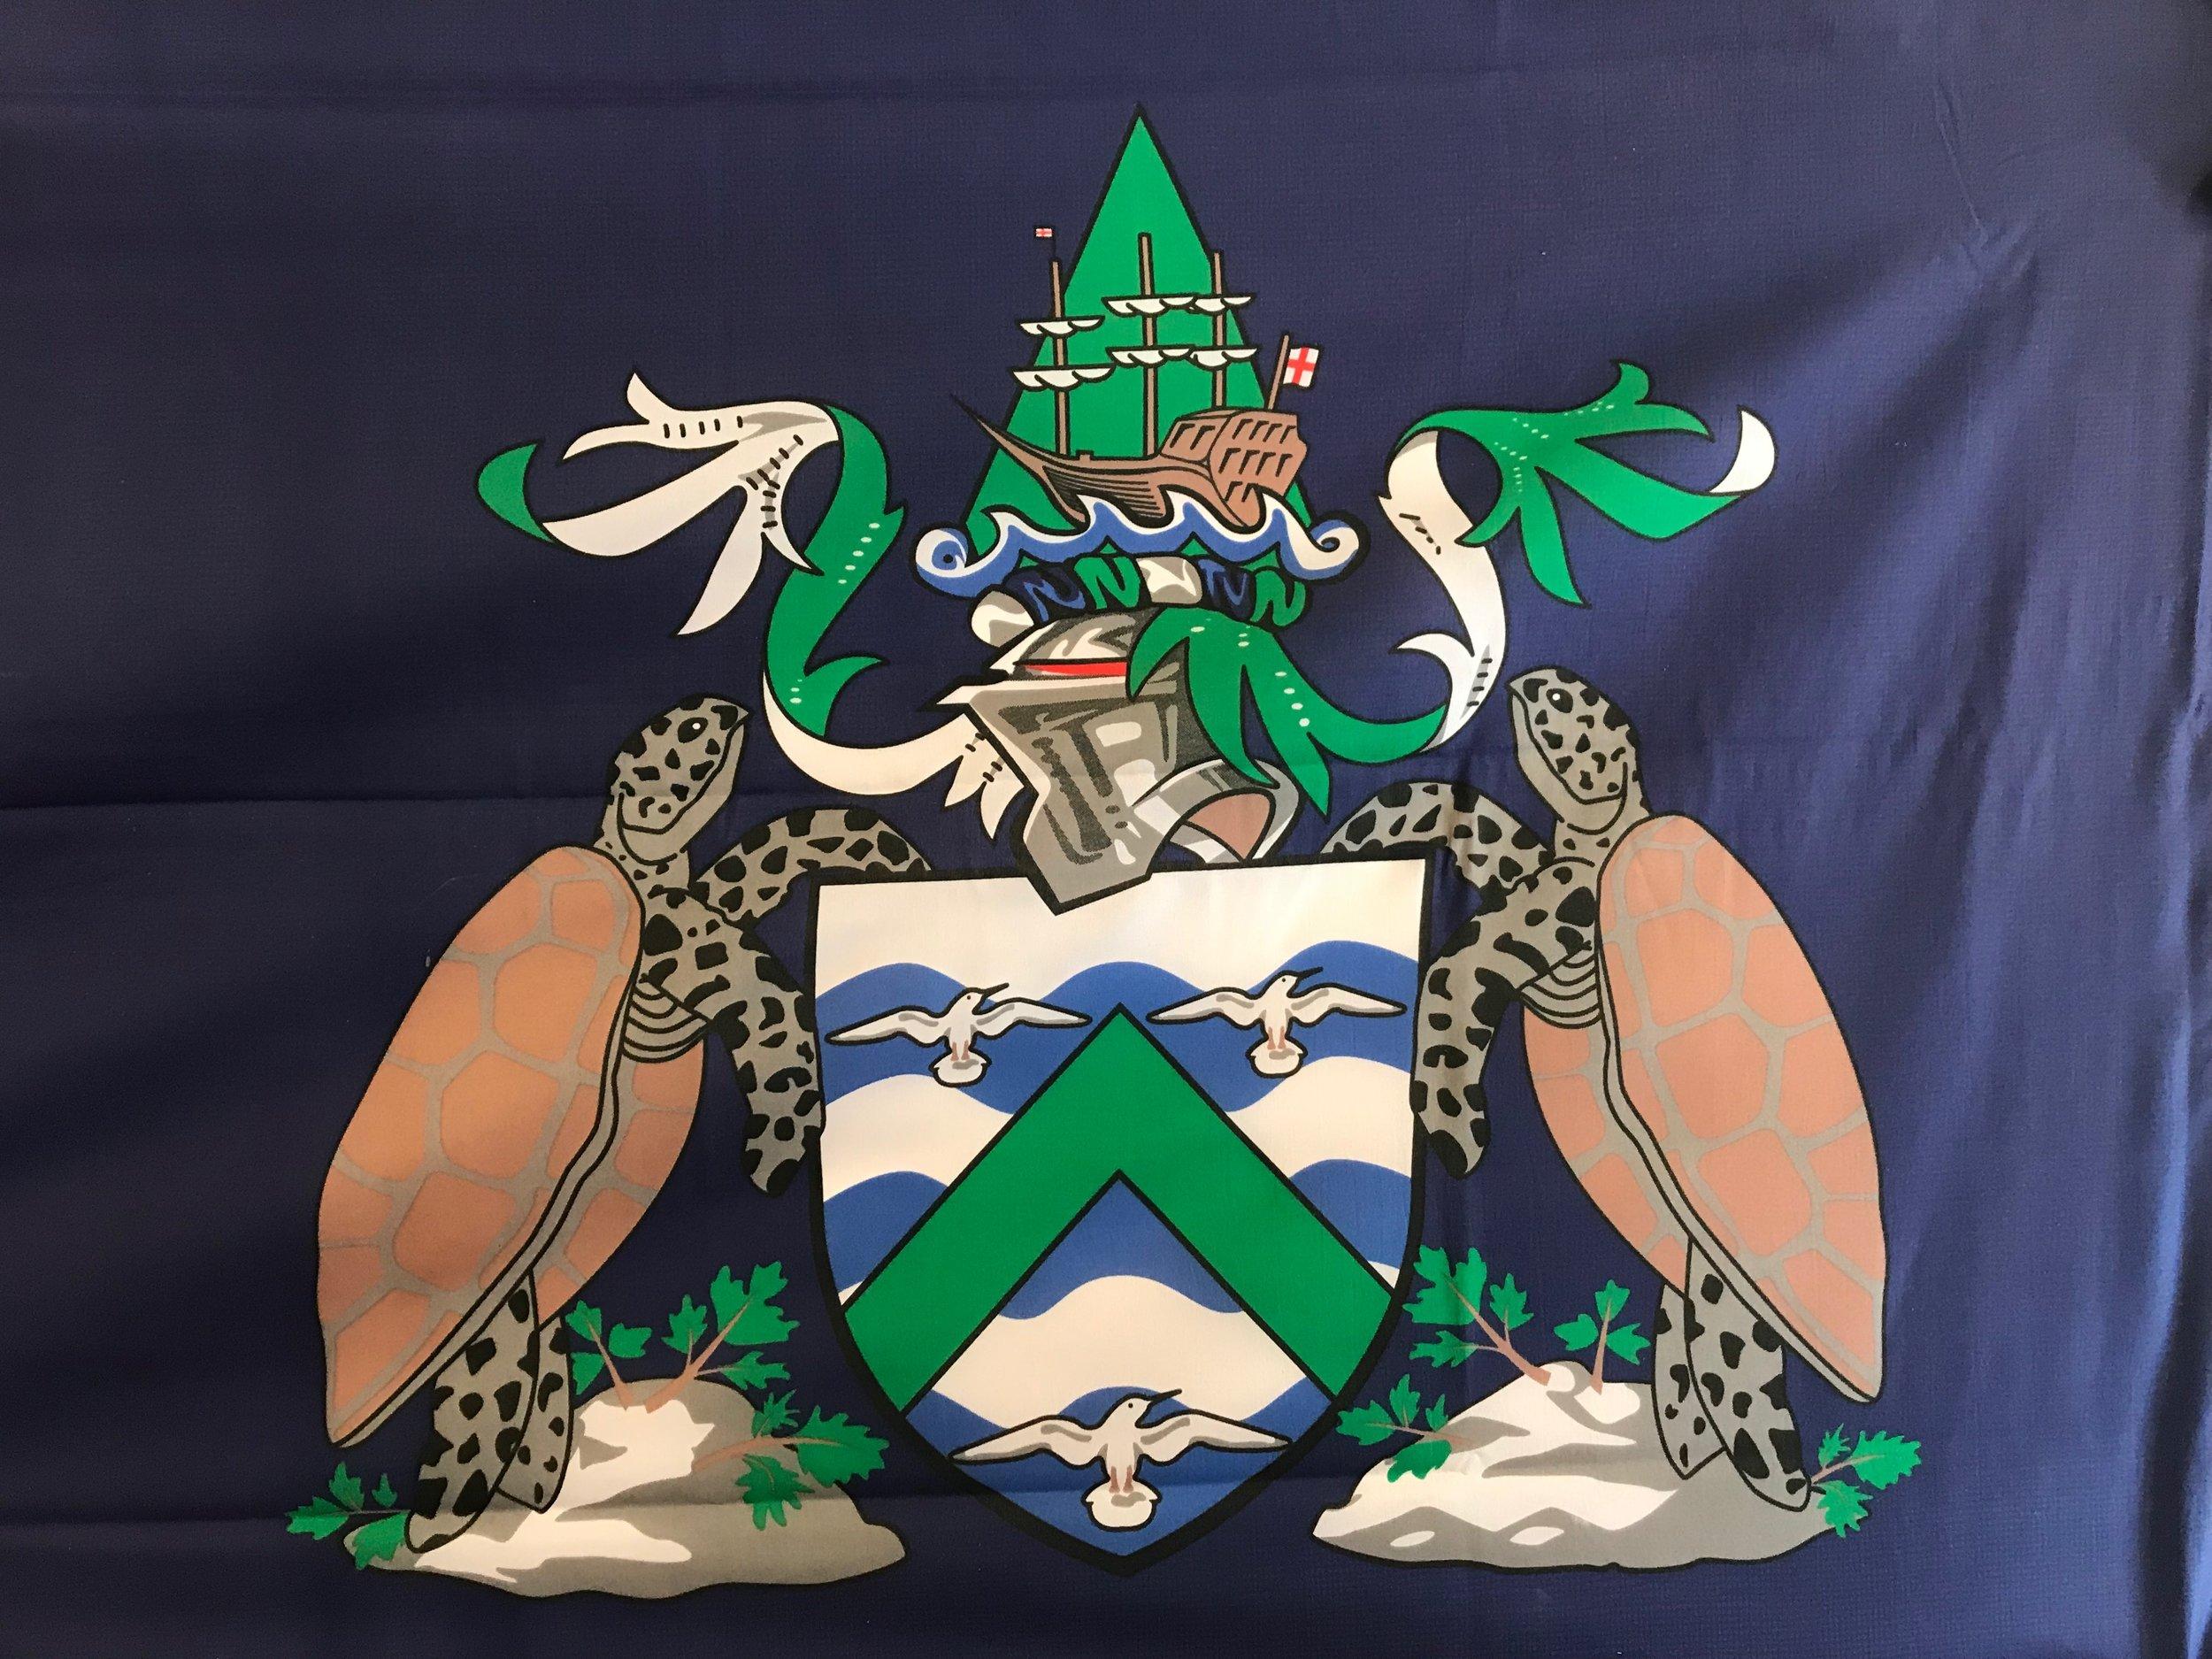 The local flag